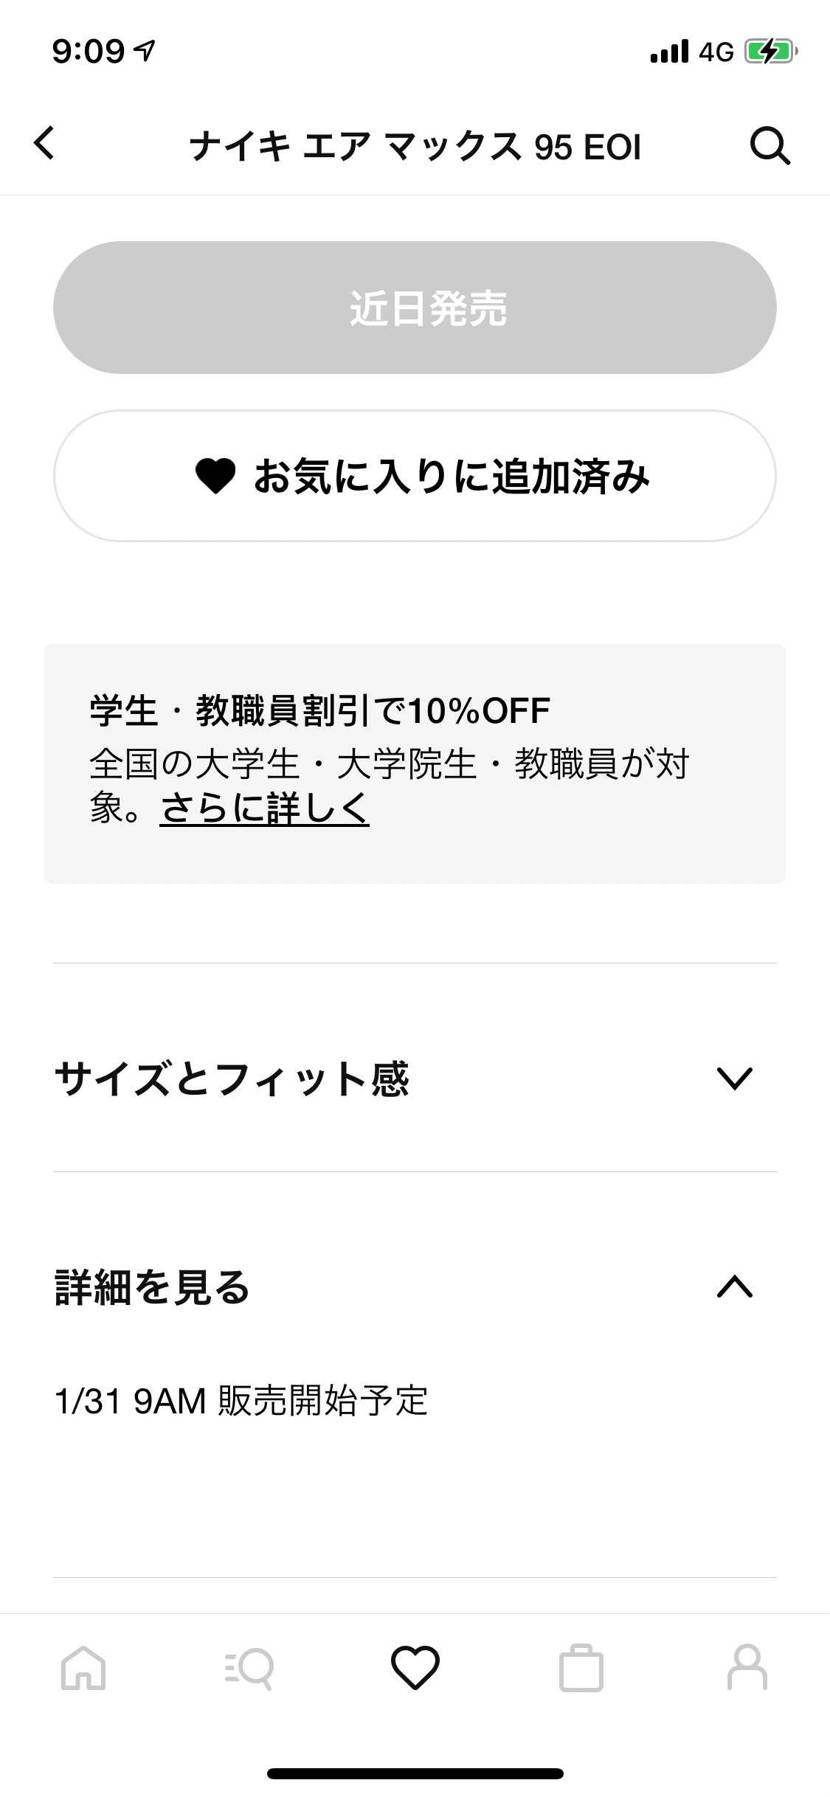 NIKE.comは明日発売みたいですね